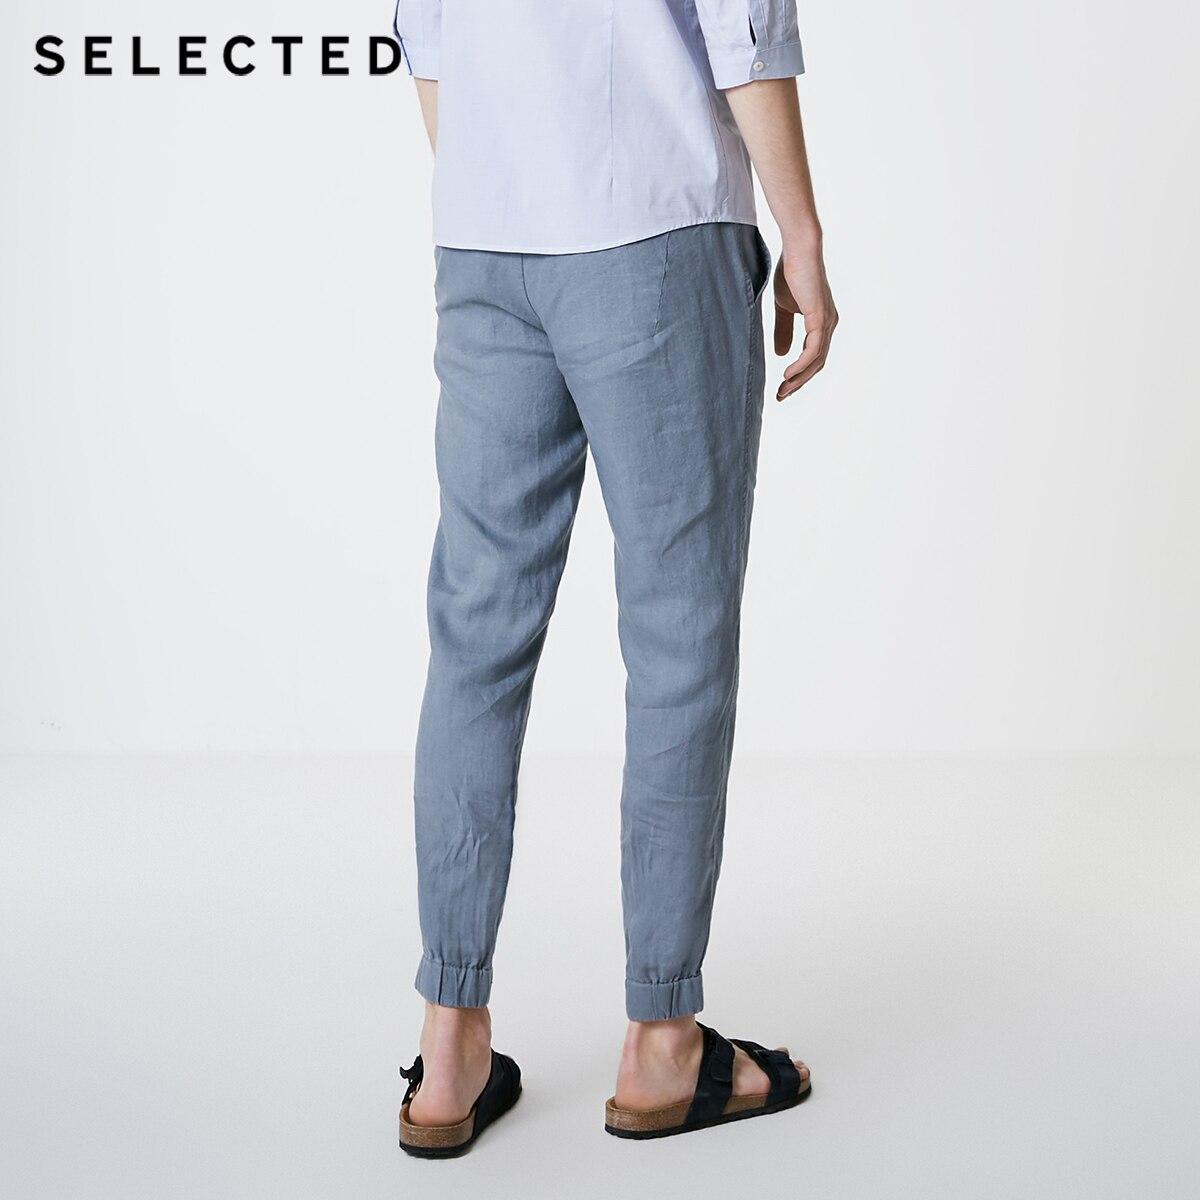 Puro 419214523 Seleccionados De Color Blue black Sand Pantalones Suelta Lino S Light Ajuste electric blue Casuales ragzIn1aW